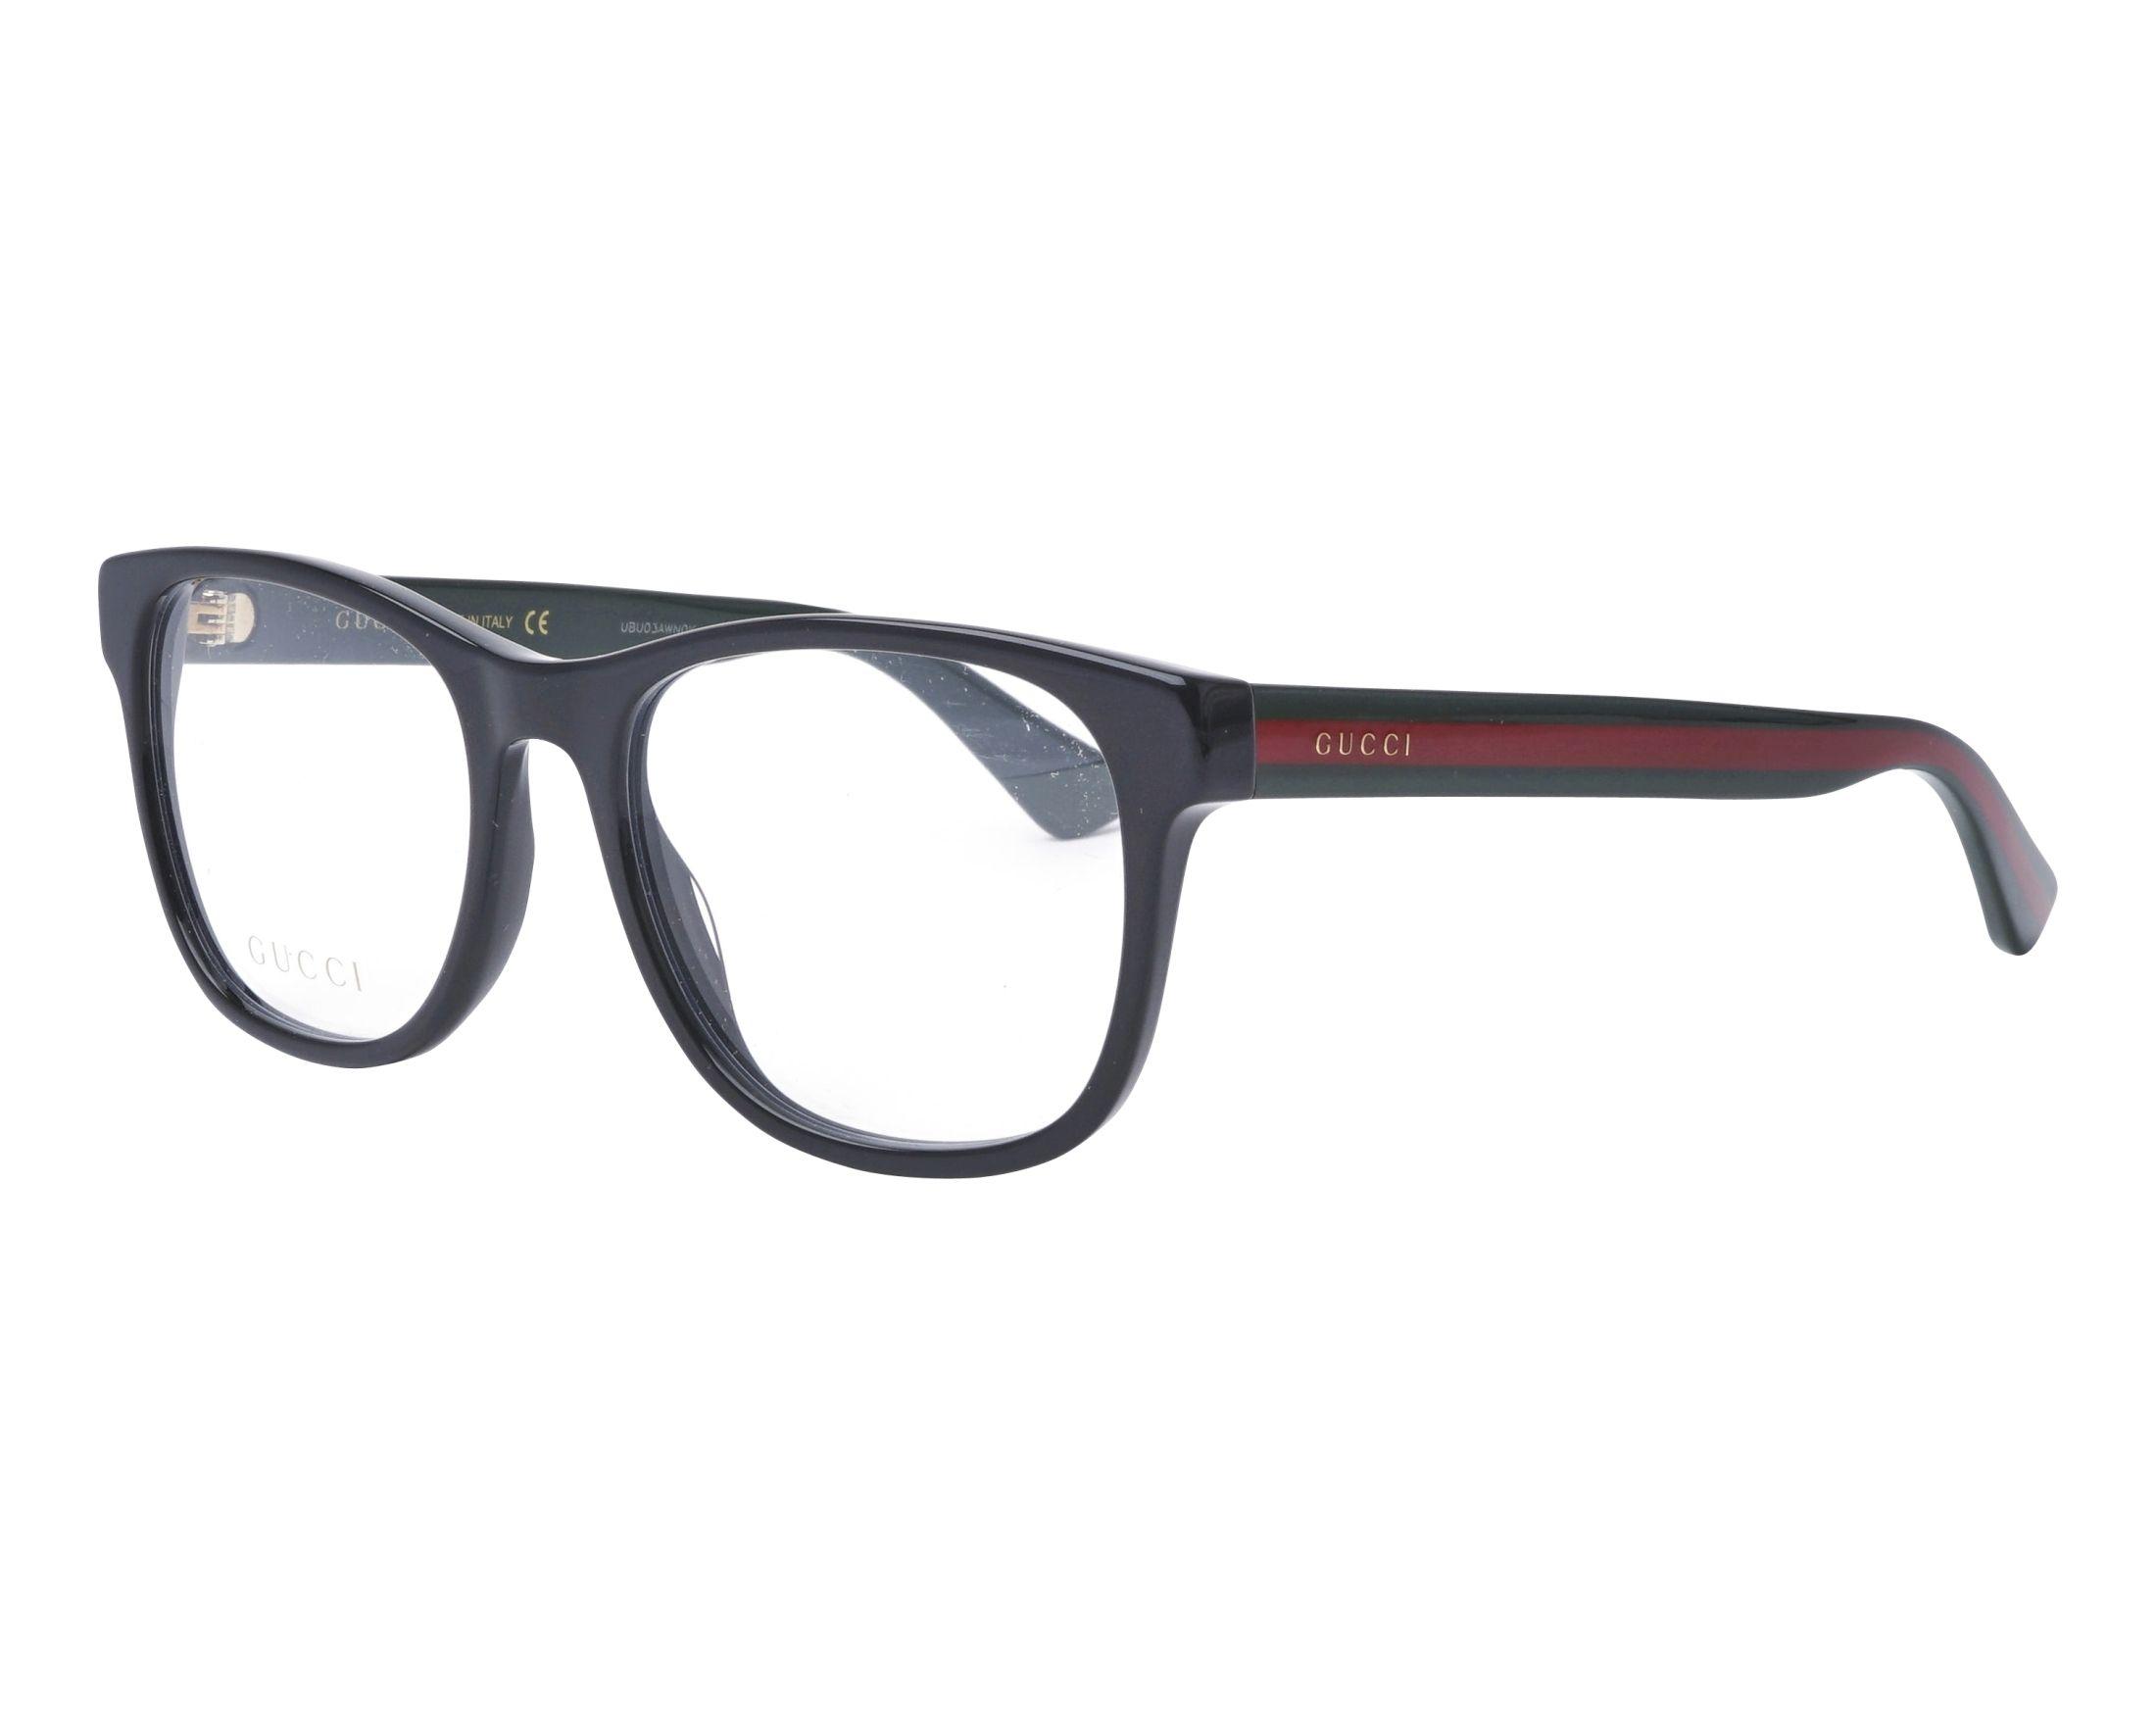 c0ecefdefd eyeglasses Gucci GG-0004-O 007 55-19 Black Green profile view